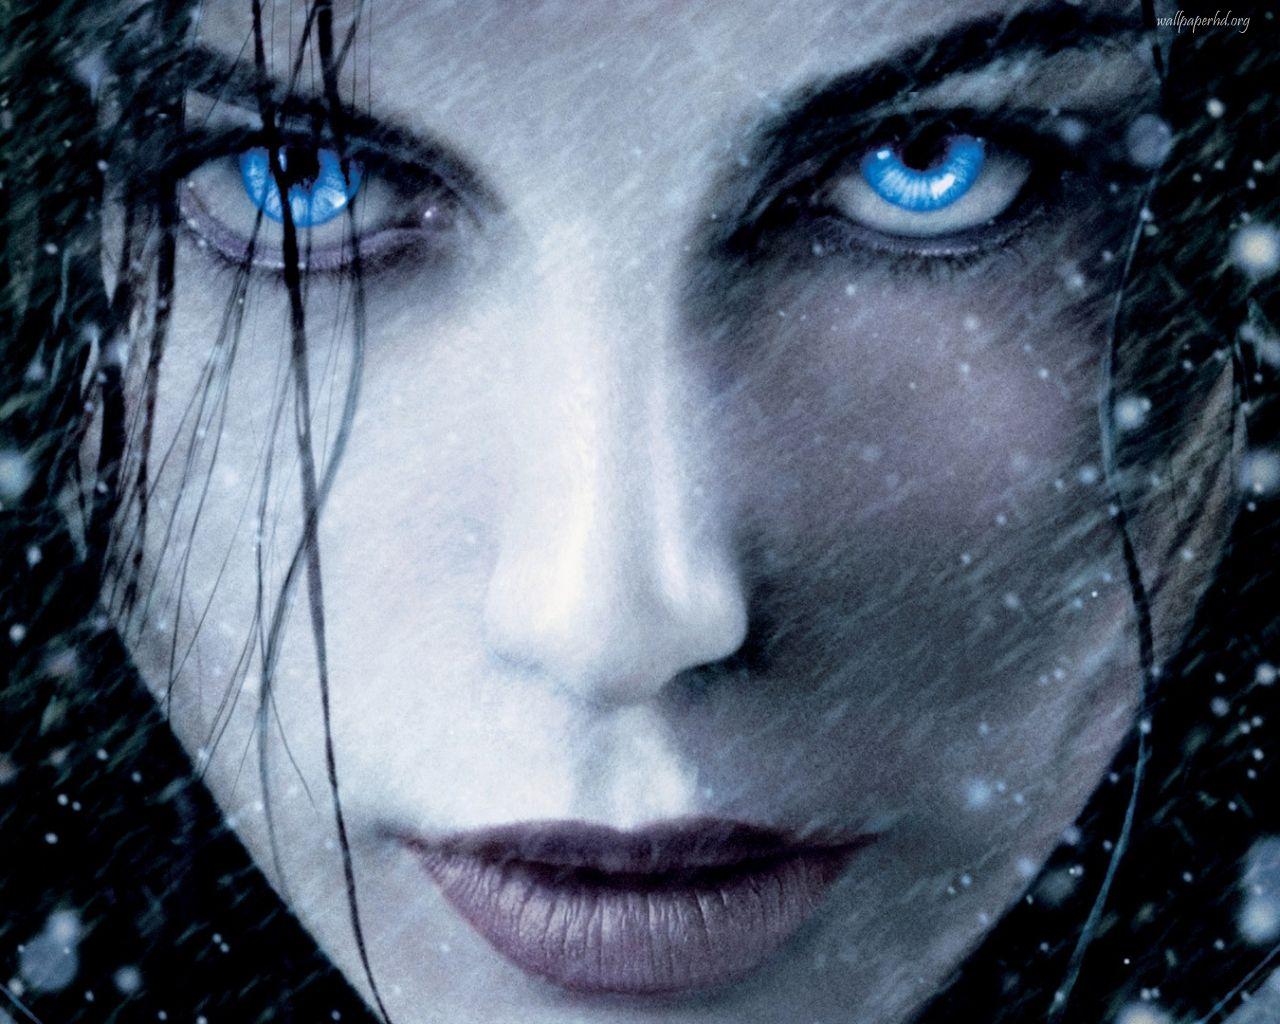 Kate Beckinsale Hd Wallpaper Unique Things Underworld Movies Underworld Kate Beckinsale